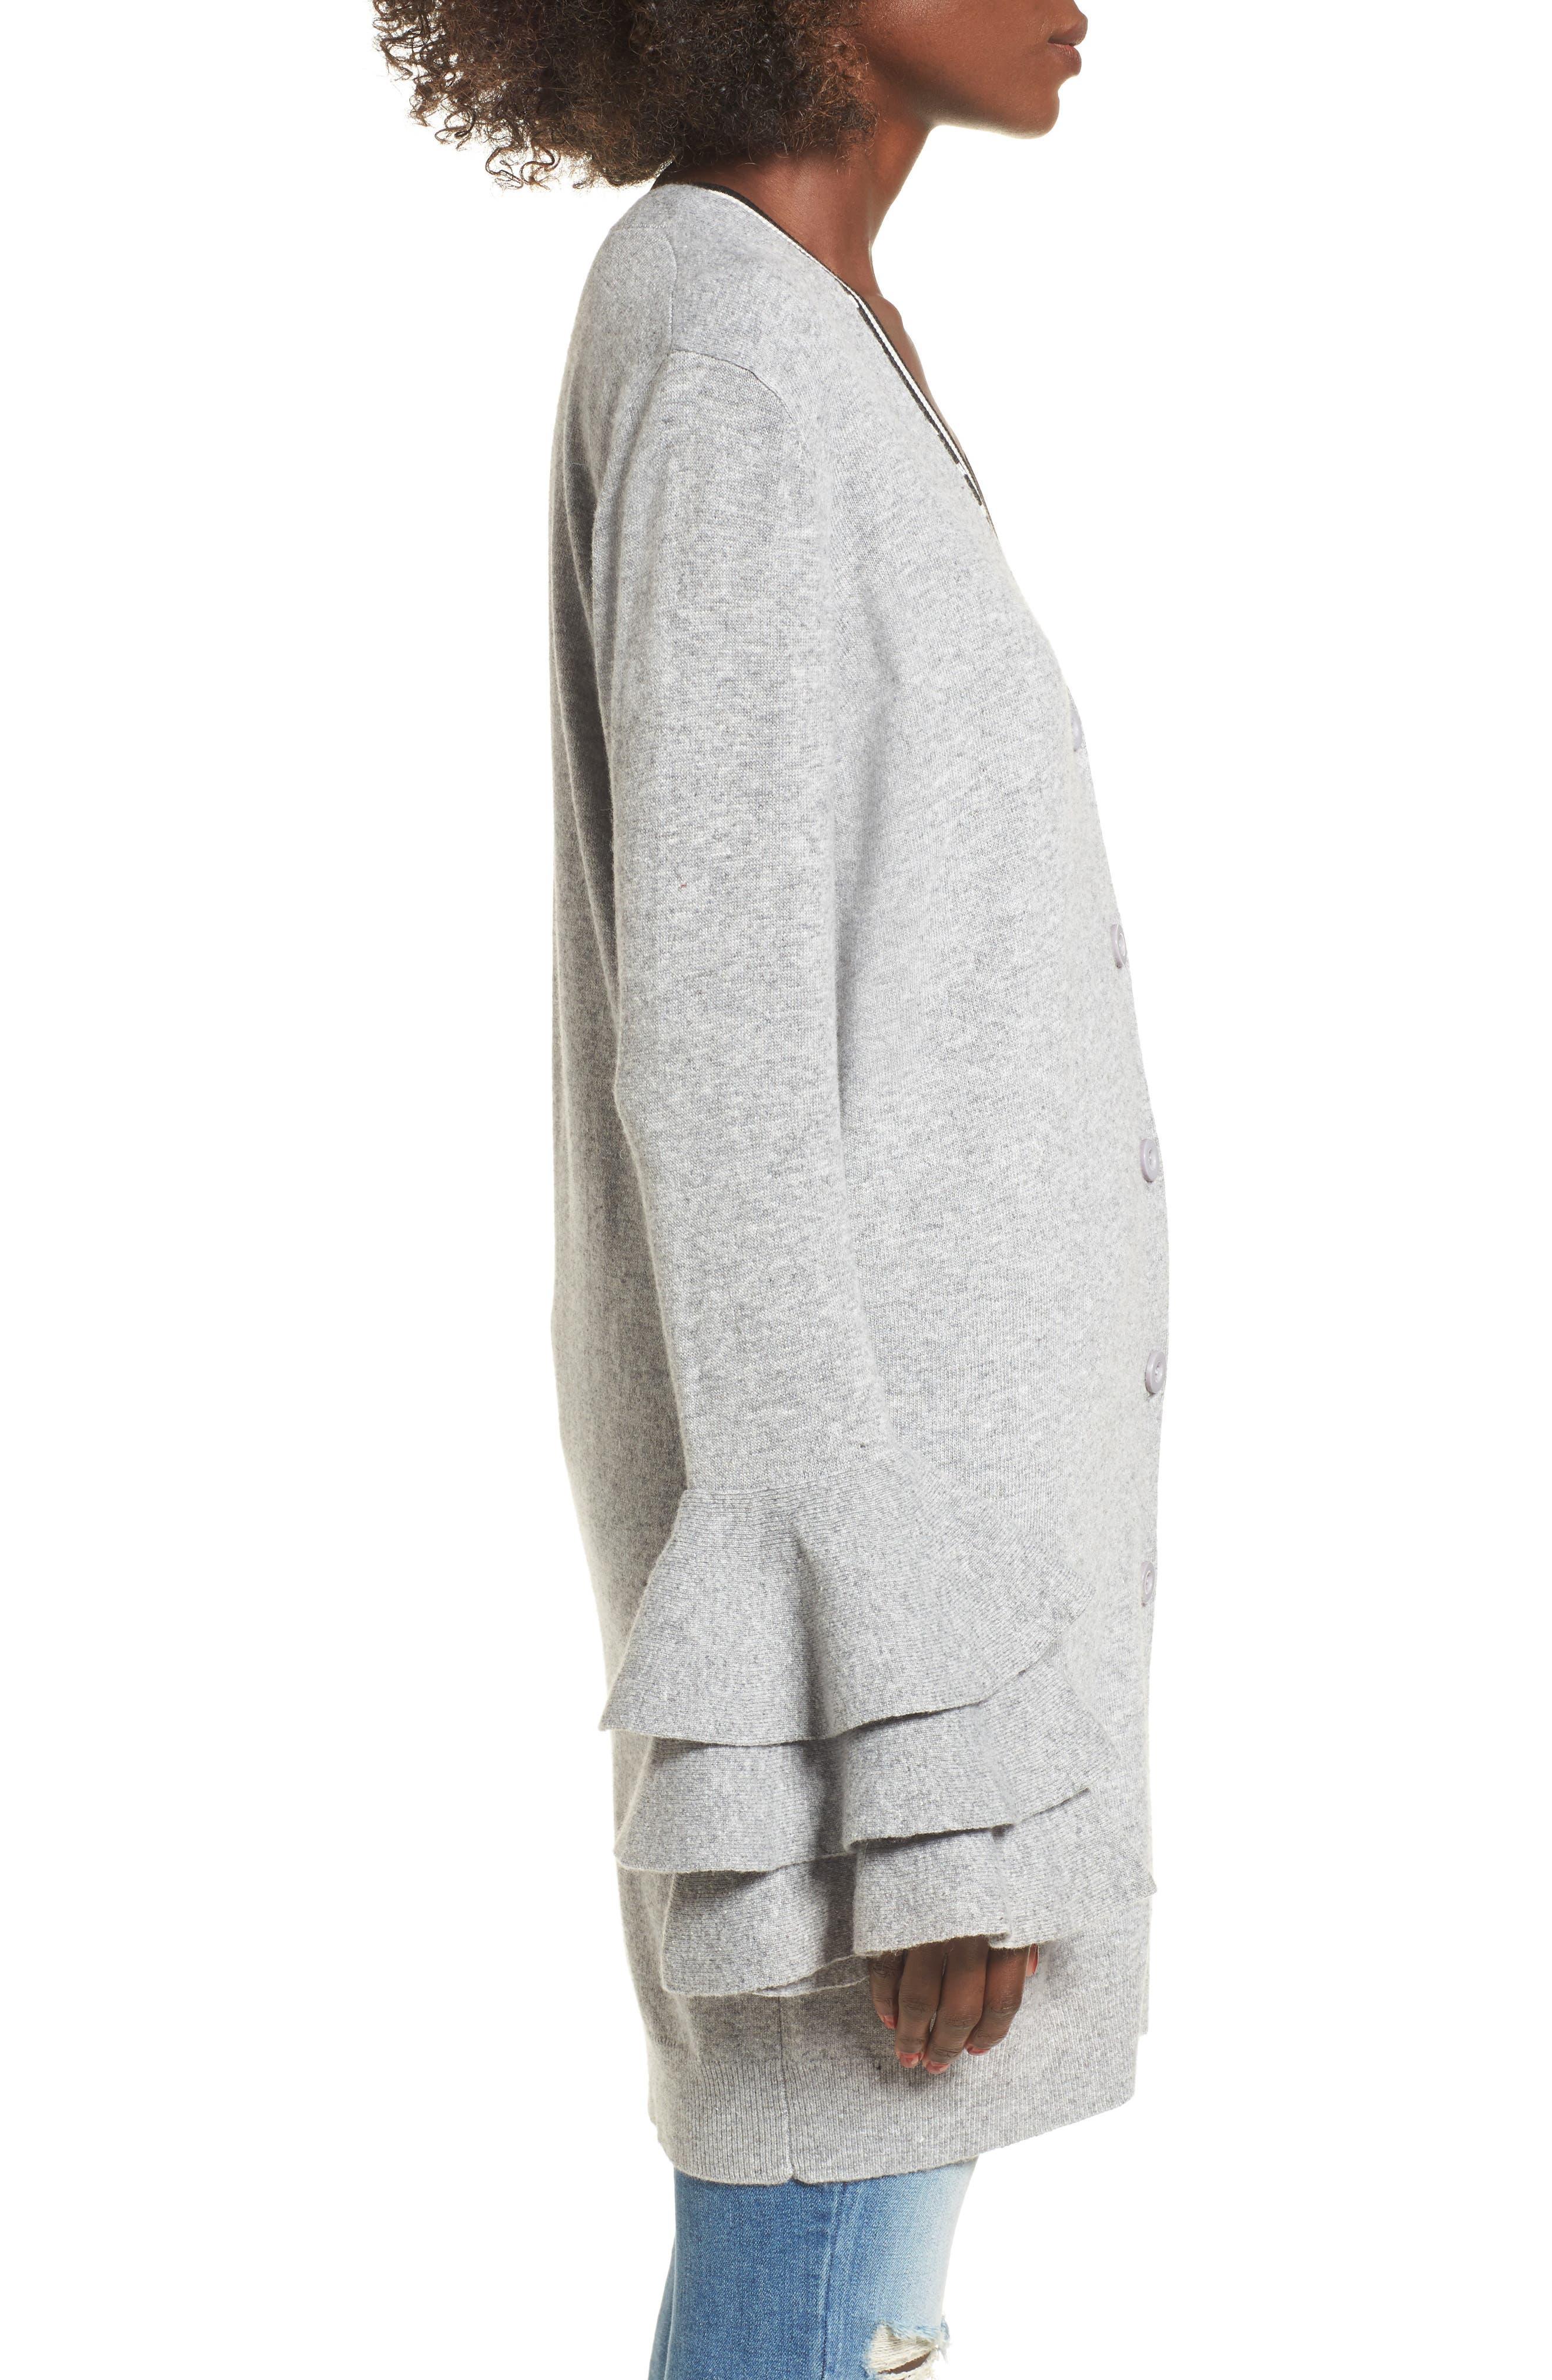 Ruffle Sleeve Longline Cardigan,                             Alternate thumbnail 3, color,                             Grey